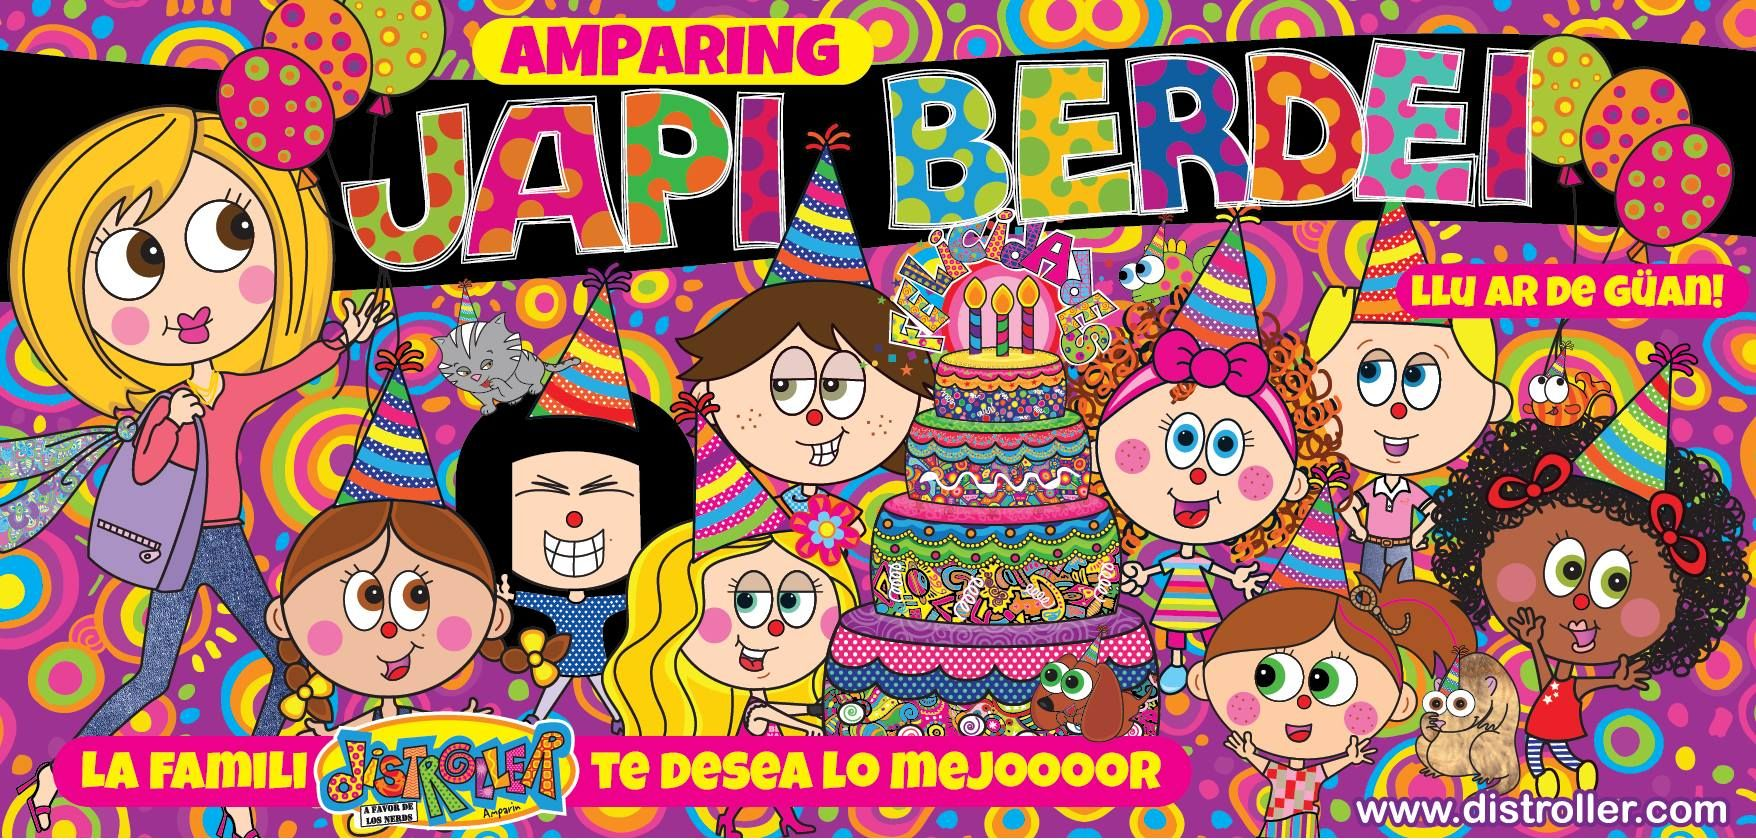 Pin De Maria Perez En I Want My Own Ksimerito Pinterest Happy